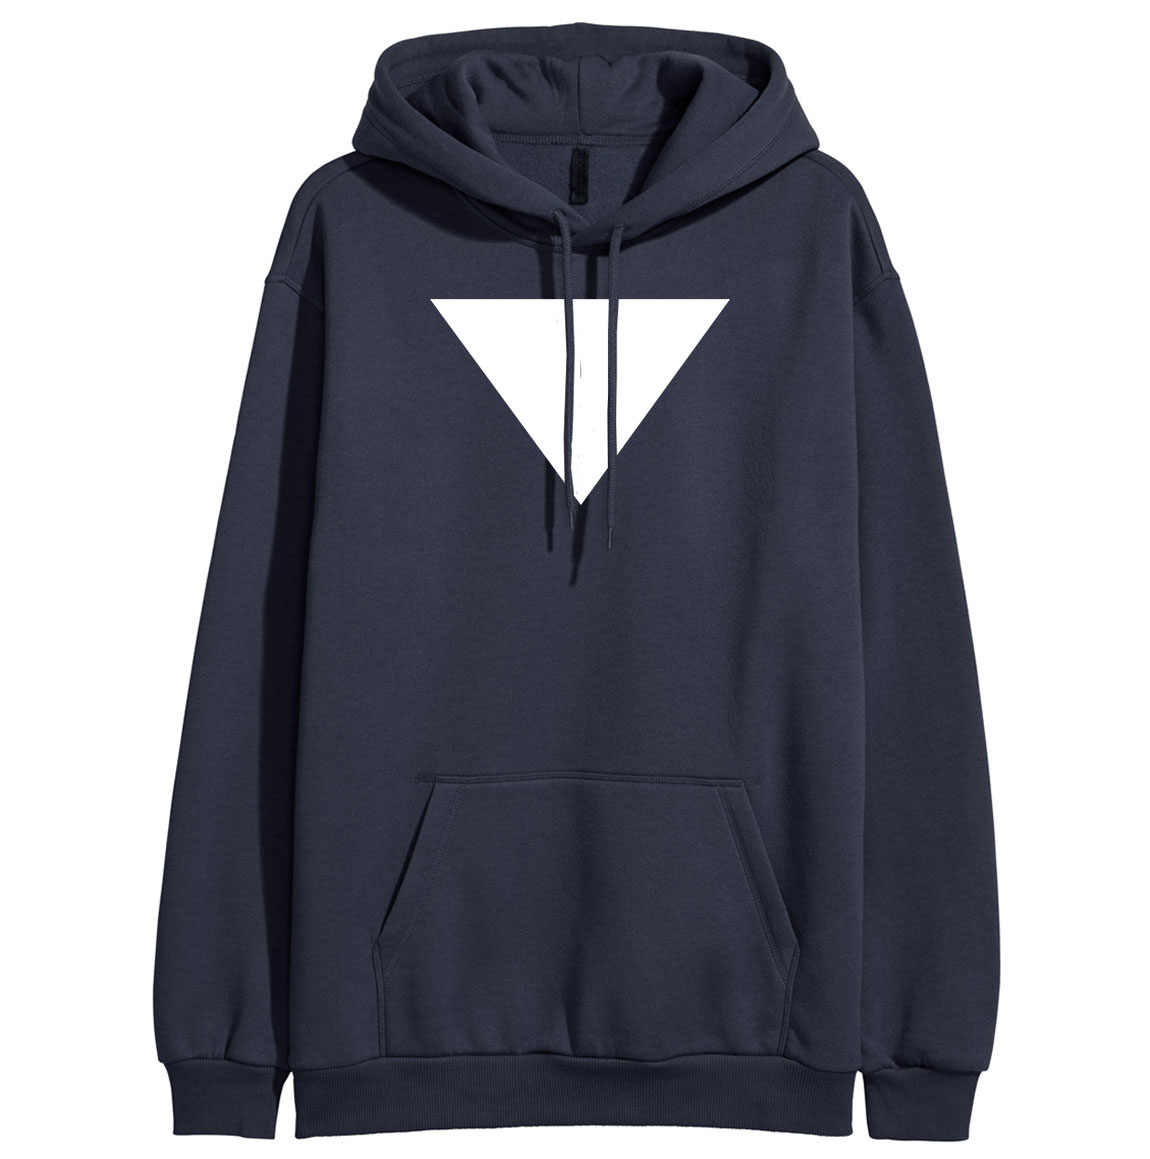 Inverted Triangle Print HipHop Streetwear 2019 Spring Hoody For Women Winter Female Sweatshirt Sportswear K-pop Clothes